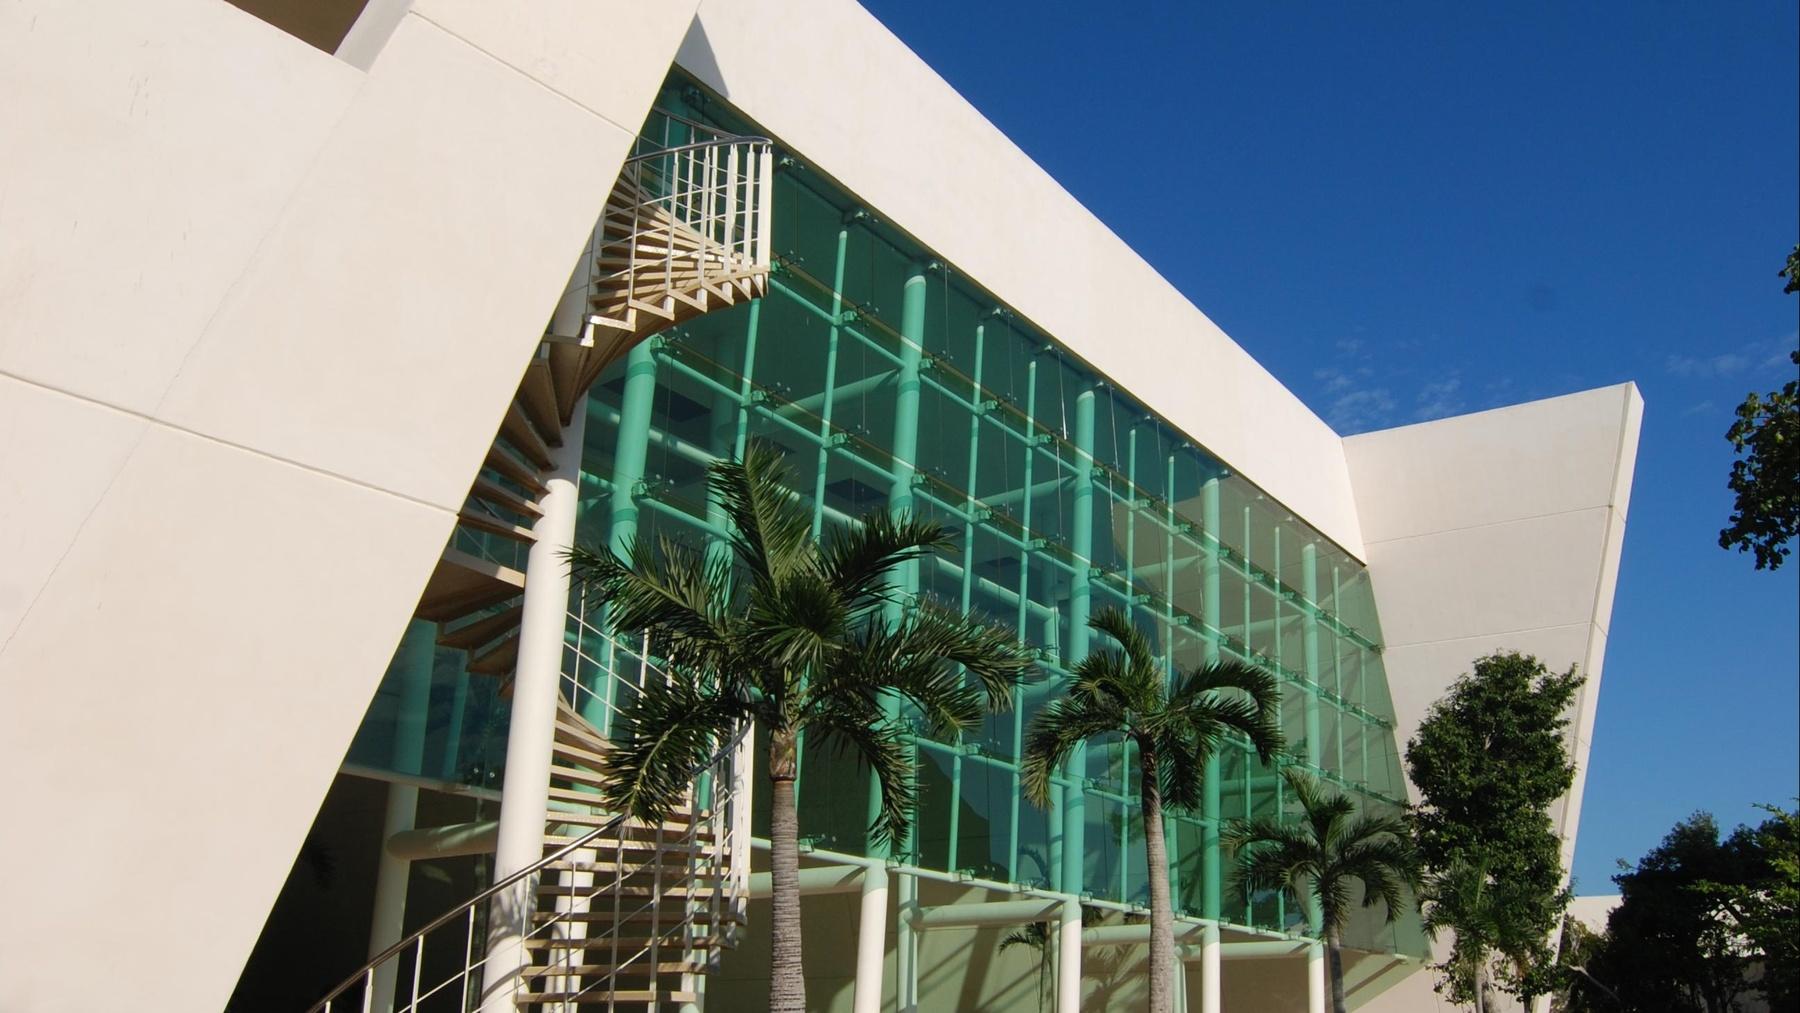 grand casino online maya symbole